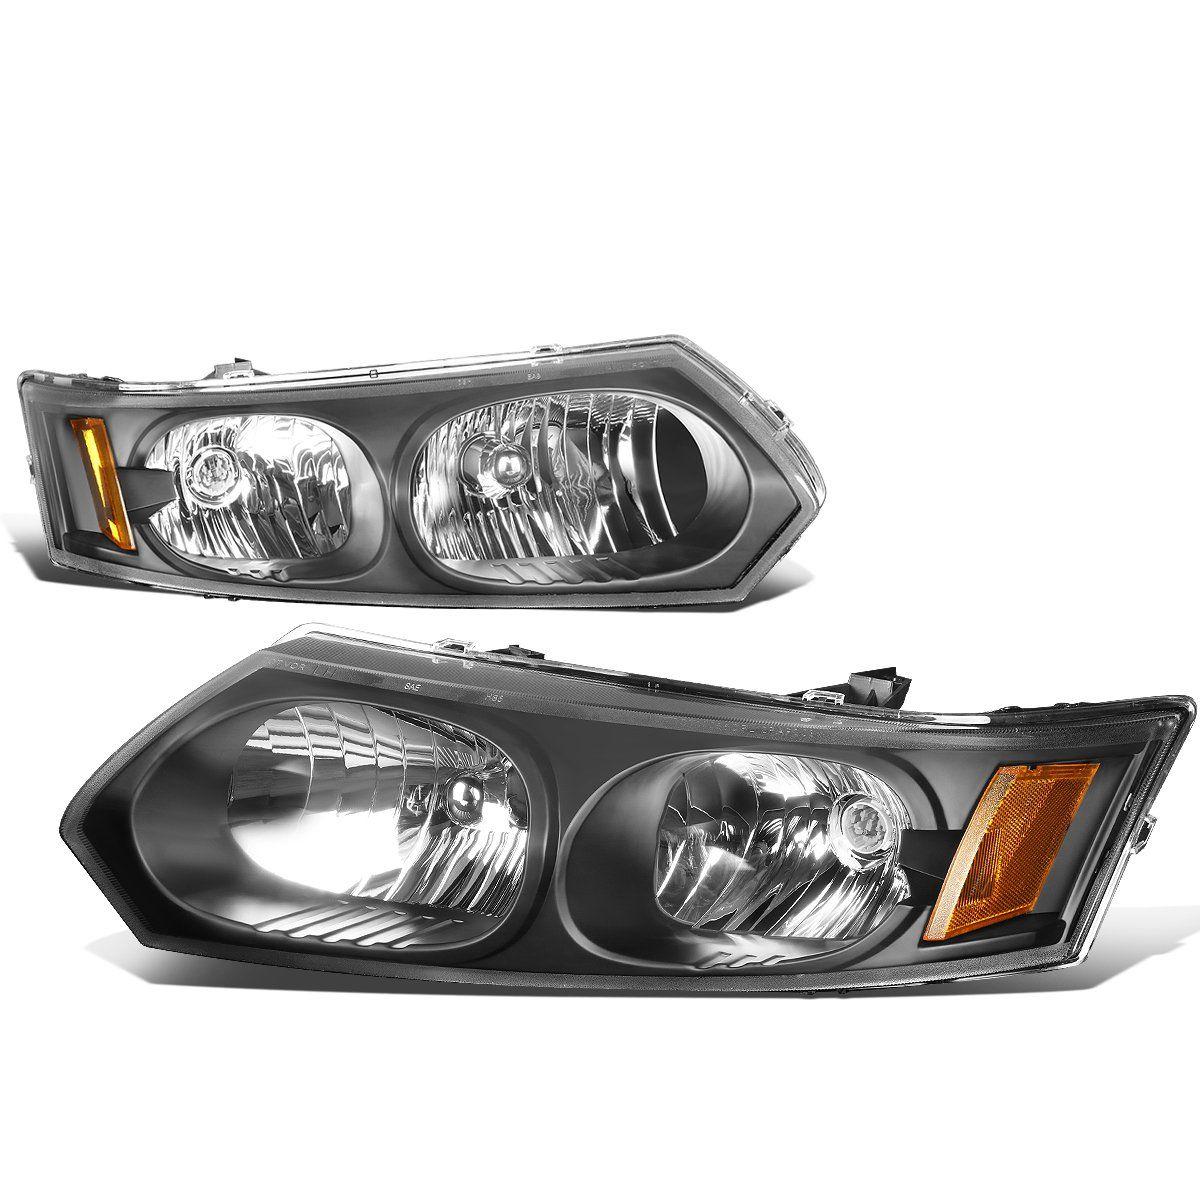 D Motoring 03 07 Saturn Ion Headlights Black Housing Amber Corner Plug N Play Pair Headlights Black House Sedan